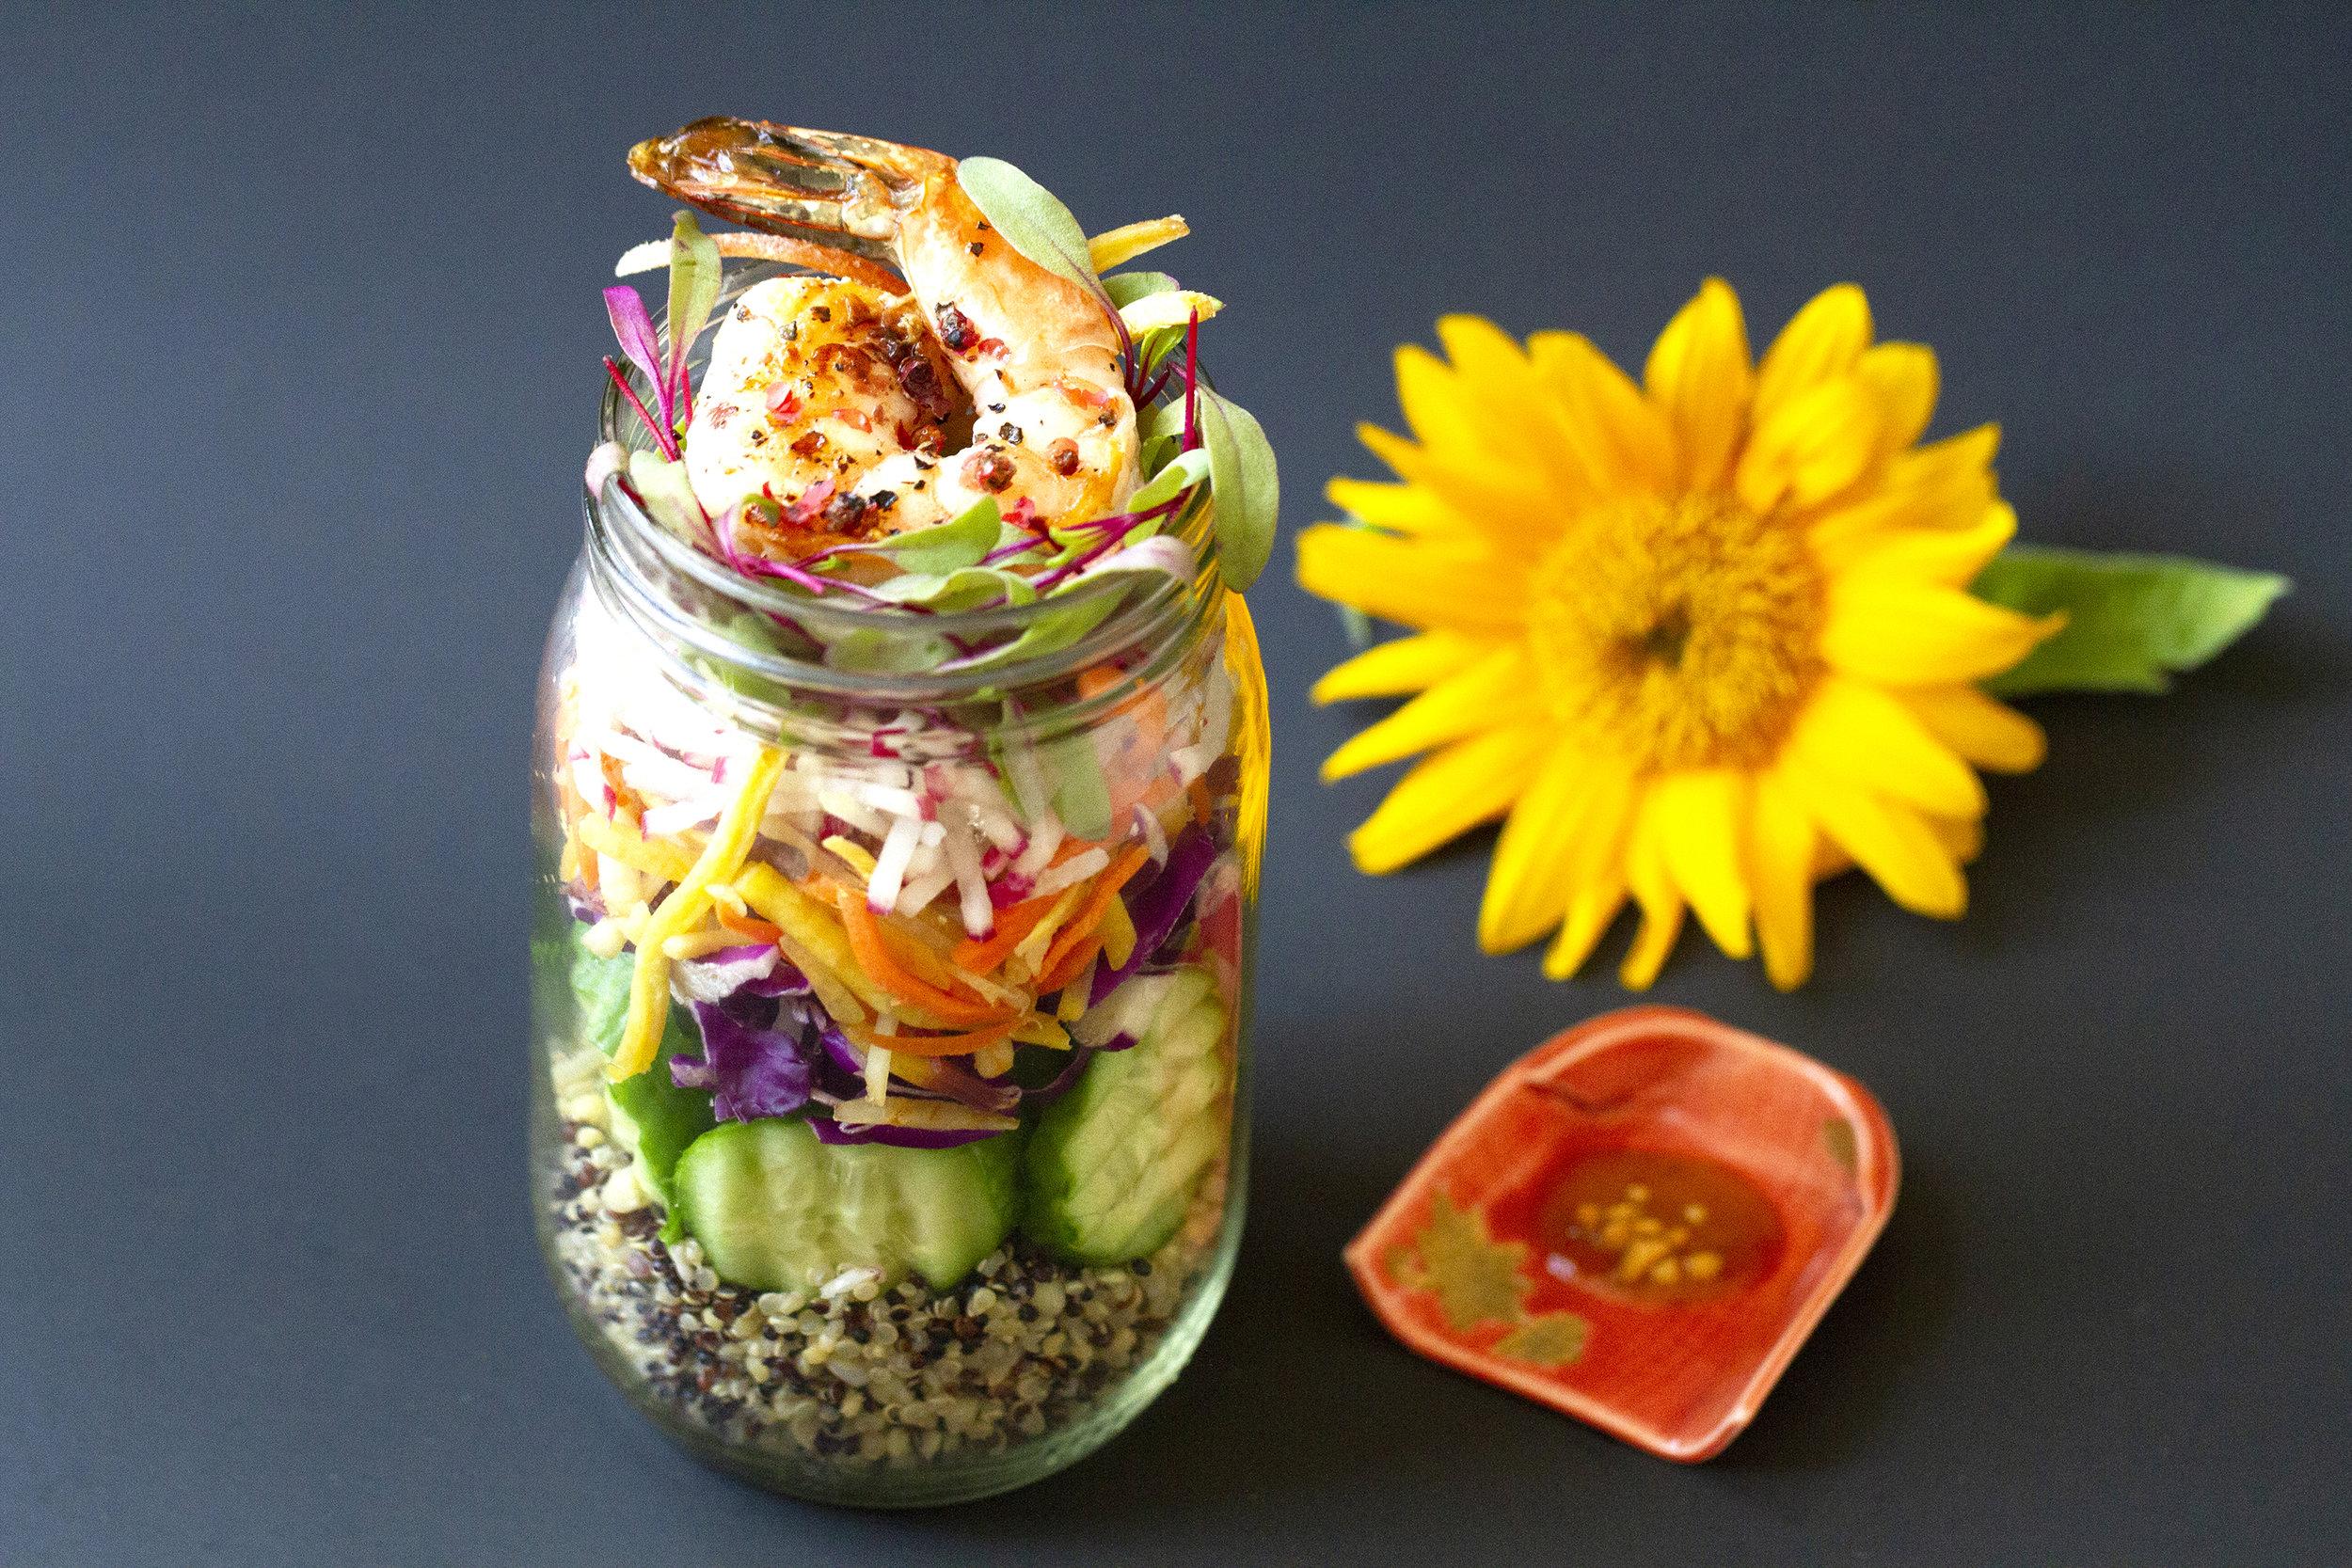 Grilled Shrimp Salad with Thai Peanut Sauce